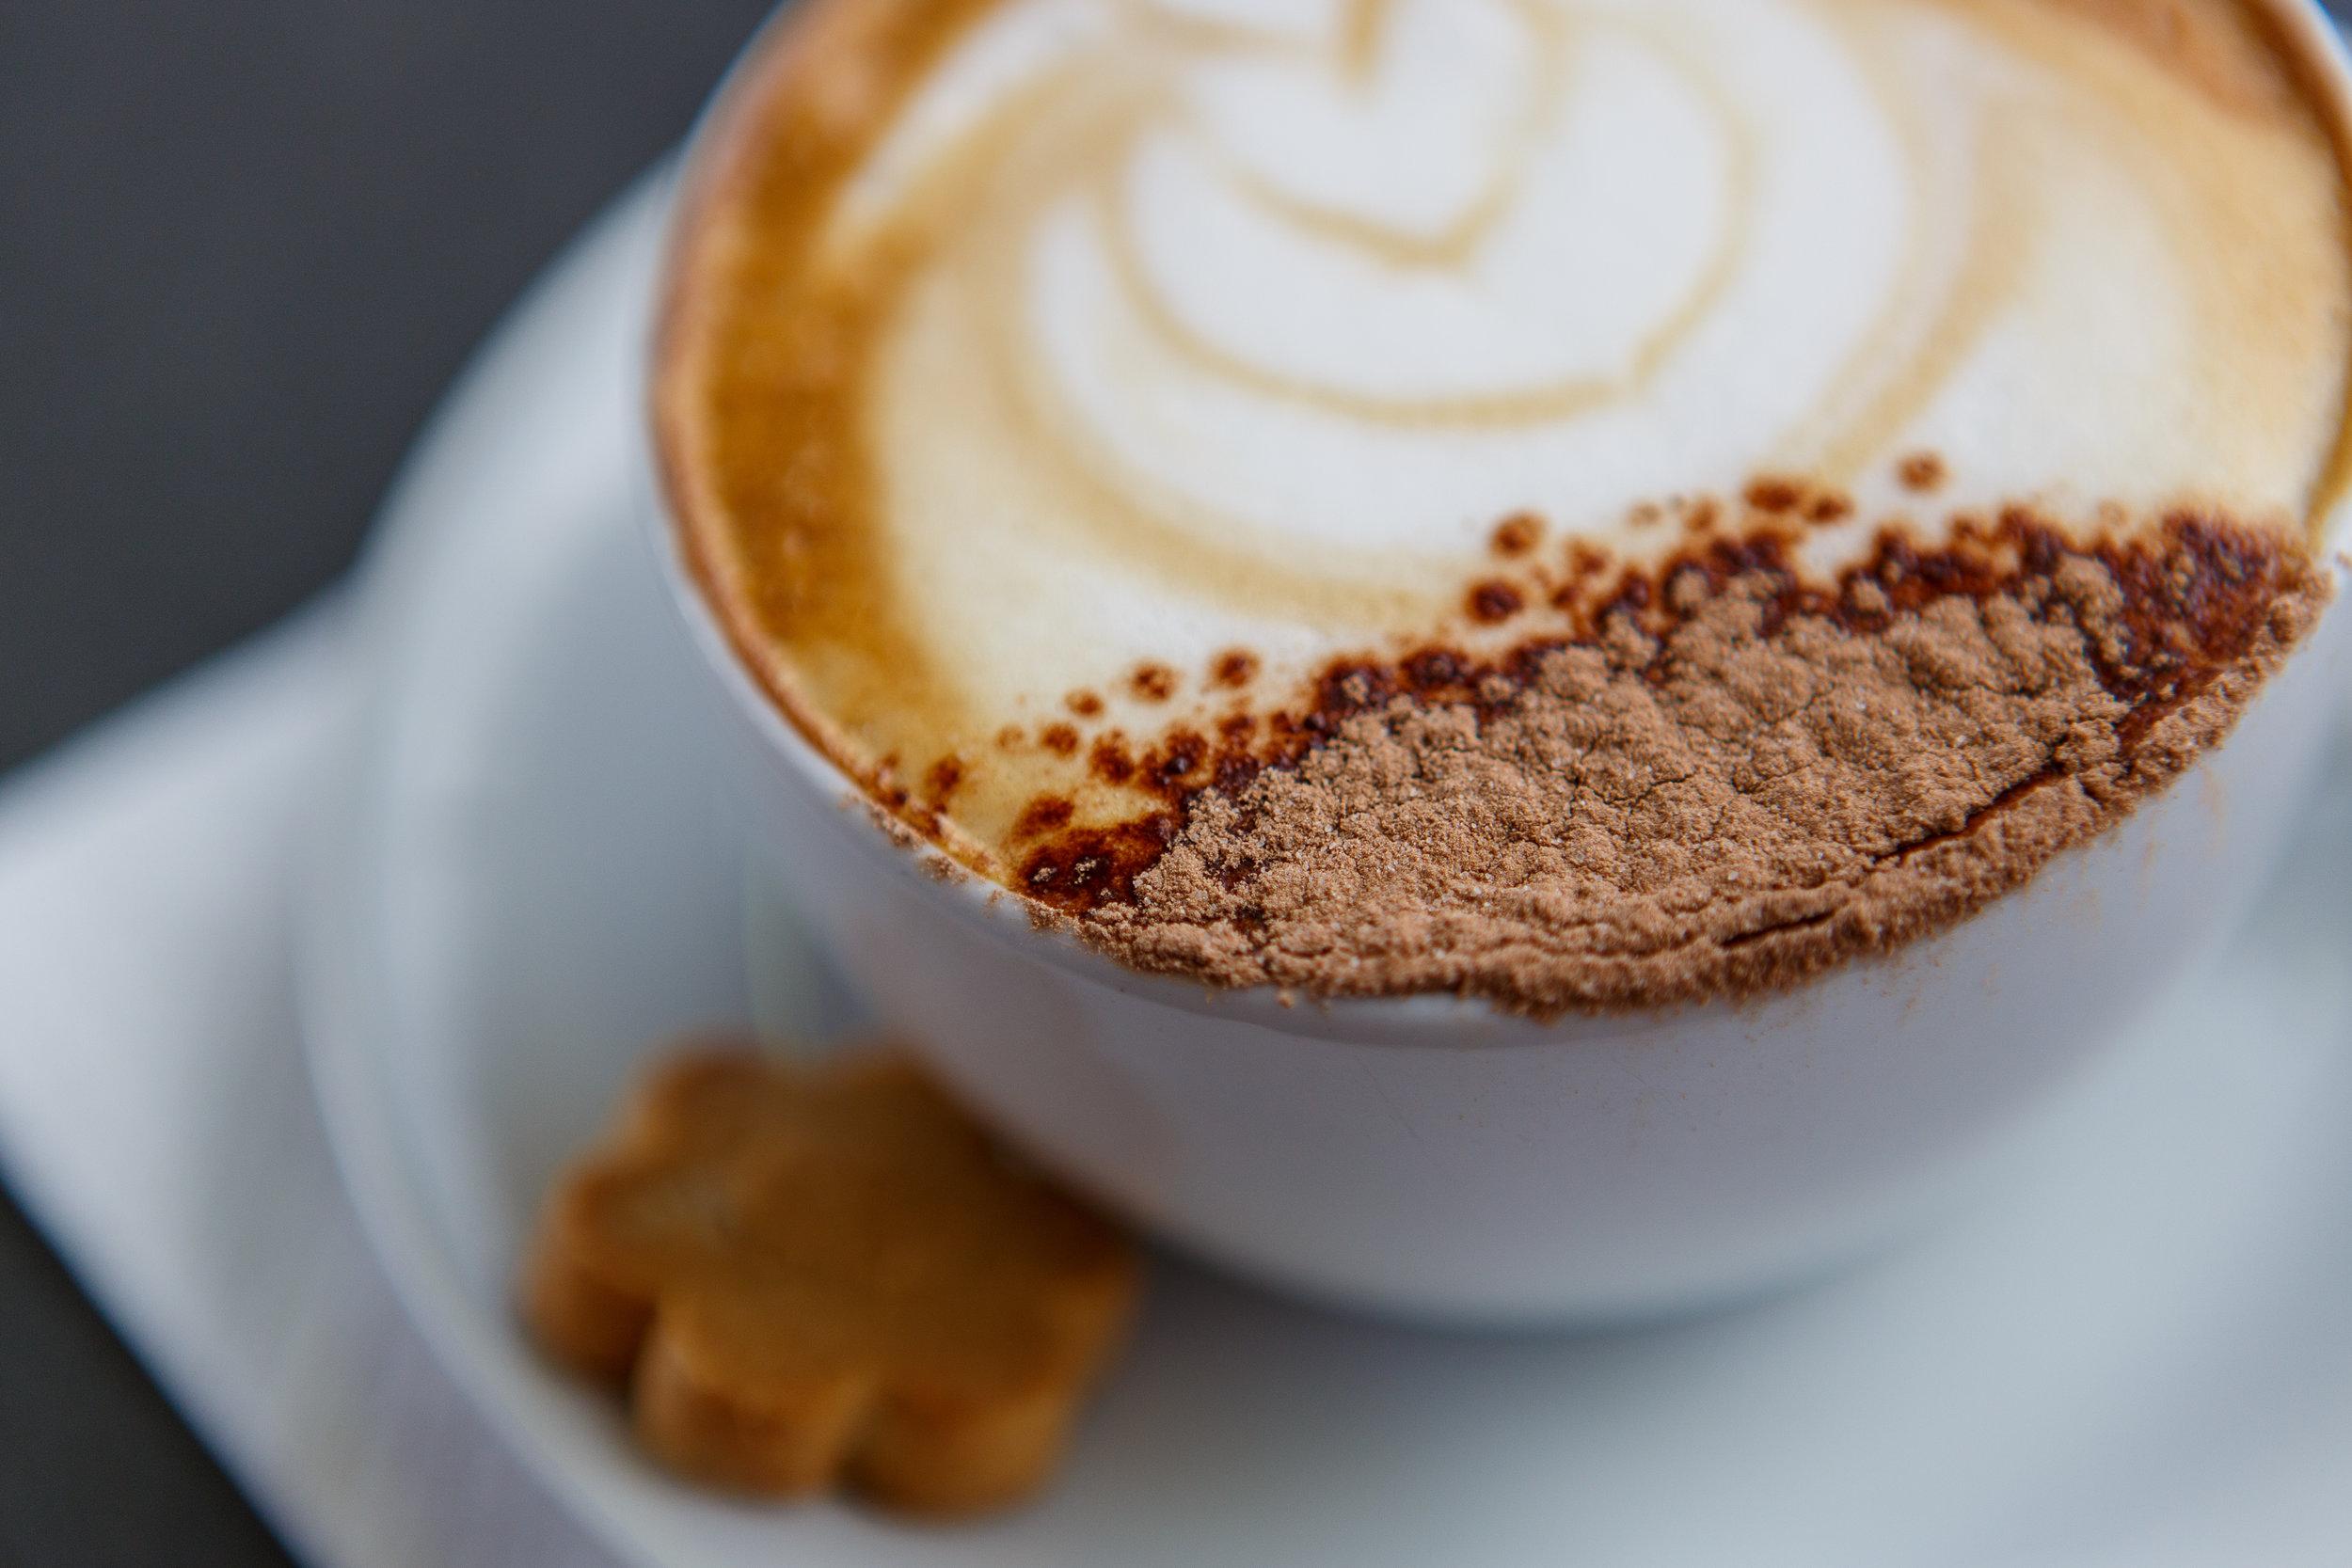 [130725-130725] Bluey's Café (Chalk Studio) _0004 [Original].jpg